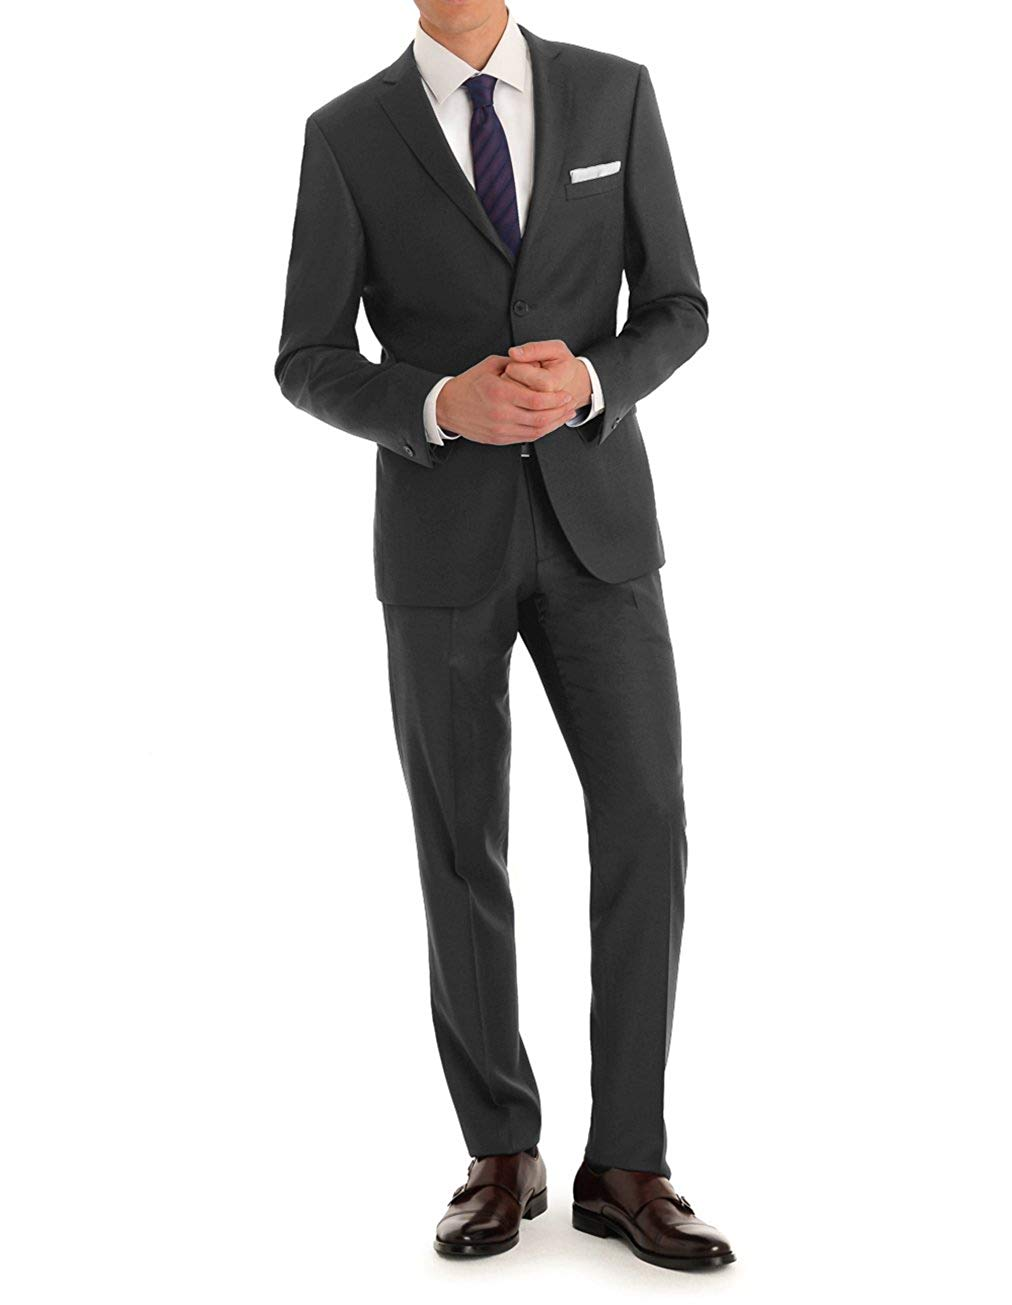 MDRN Uomo Men's Slim Fit 2 Piece Suit